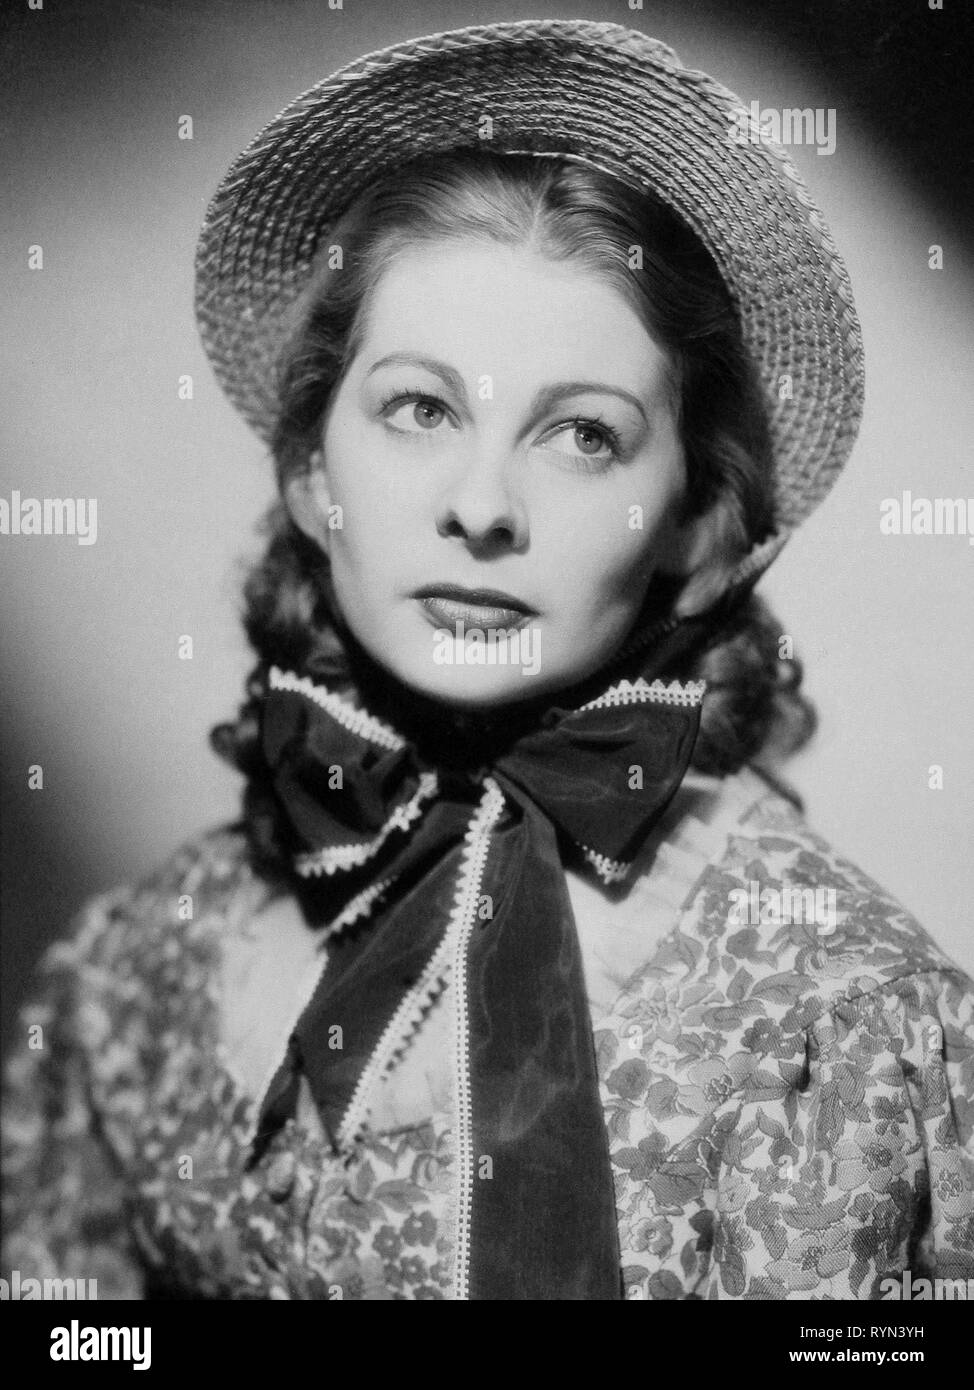 INGRID BERGMAN, GASLIGHT, 1944 Stock Photo